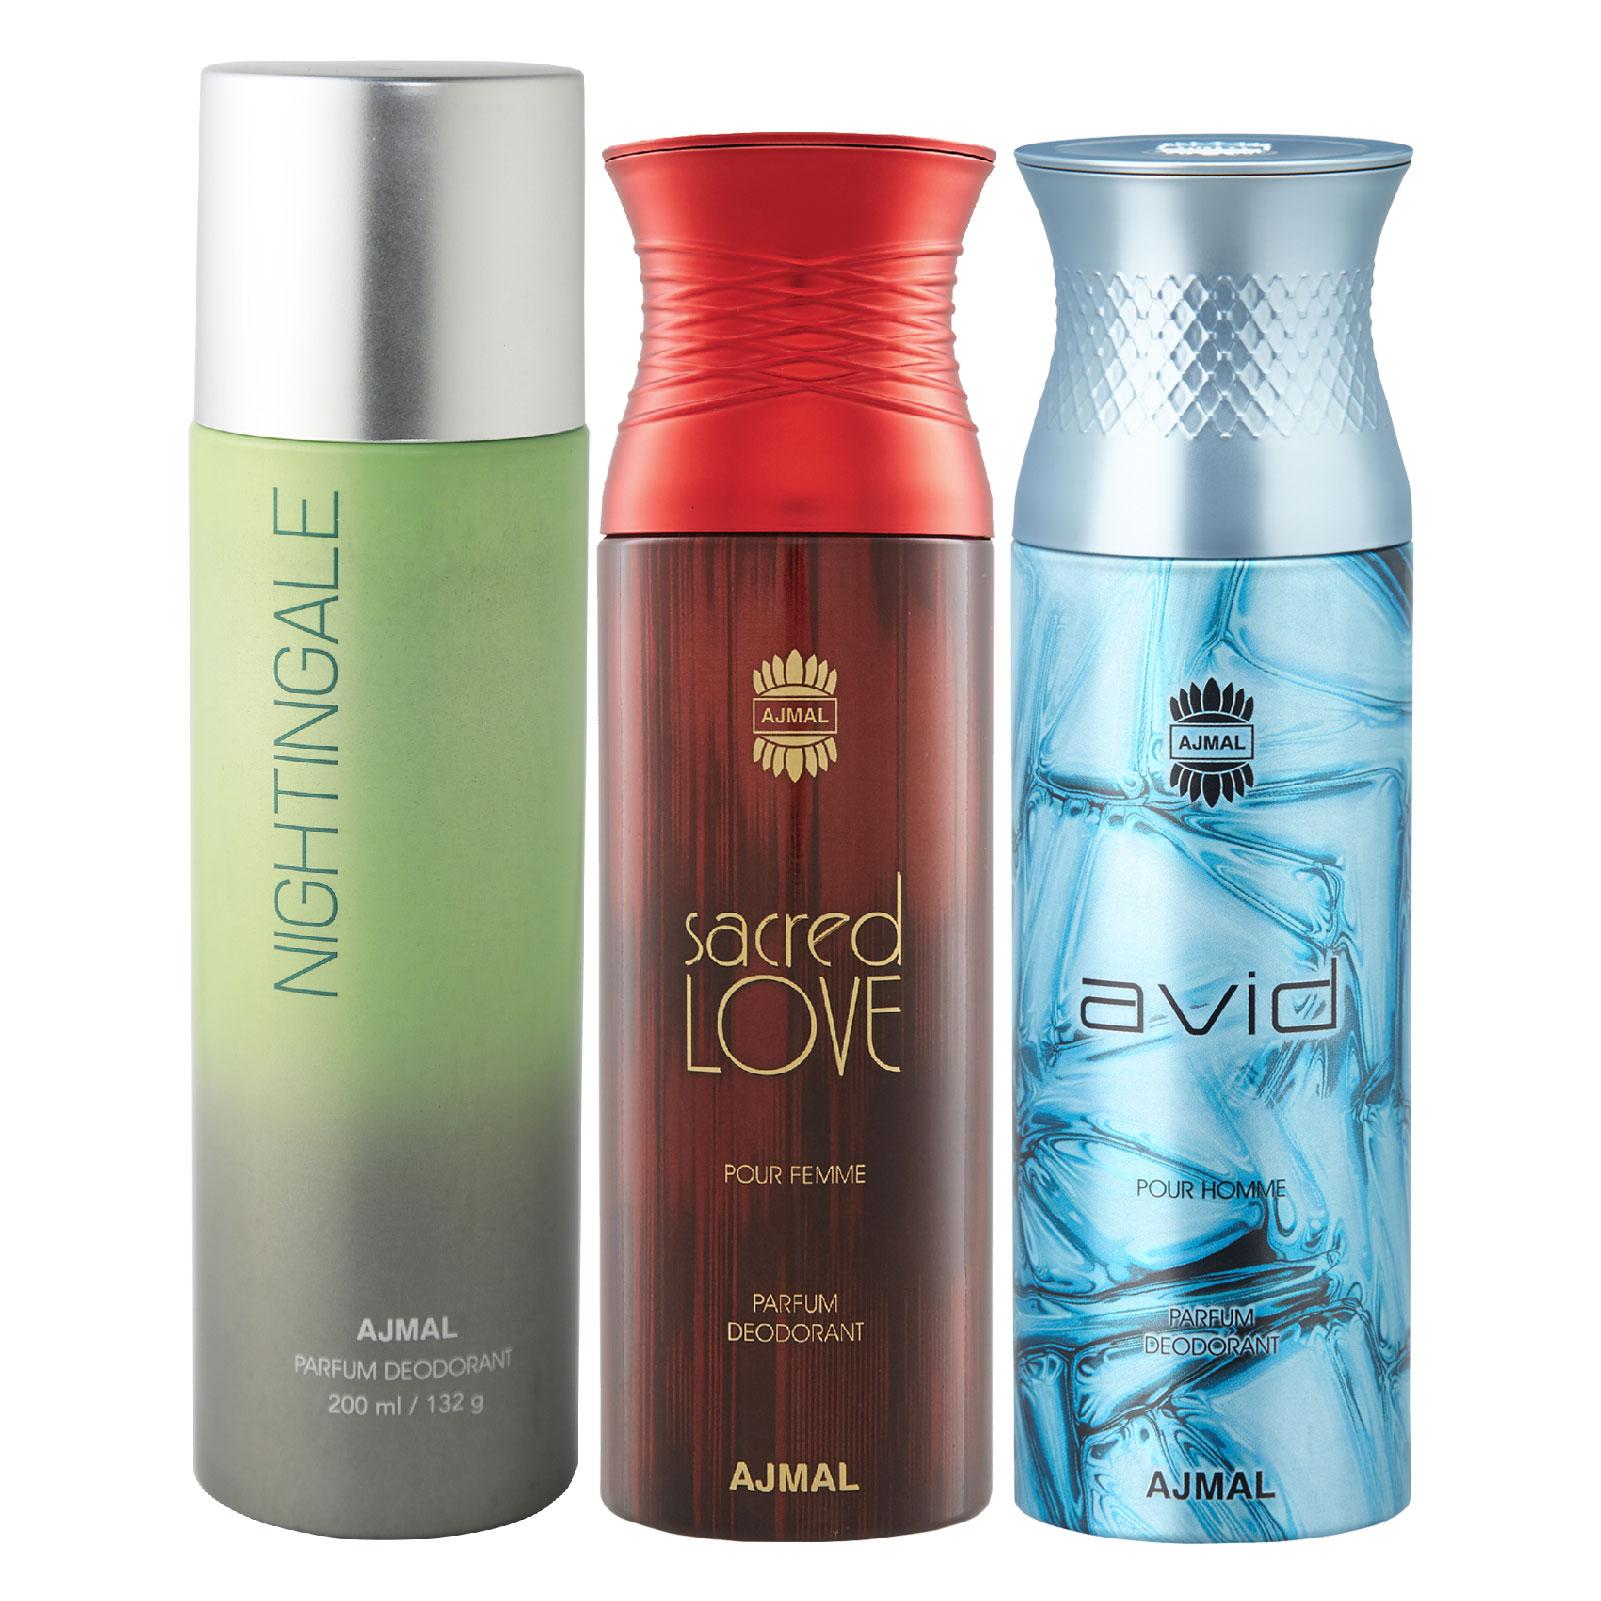 Ajmal | Ajmal 1 Nightingale for Men & Women, 1 Sacred Love for Women and 1 Avid for Men High Quality Deodorants each 200ML Combo pack of 3 (Total 600ML) + 3 Parfum Testers